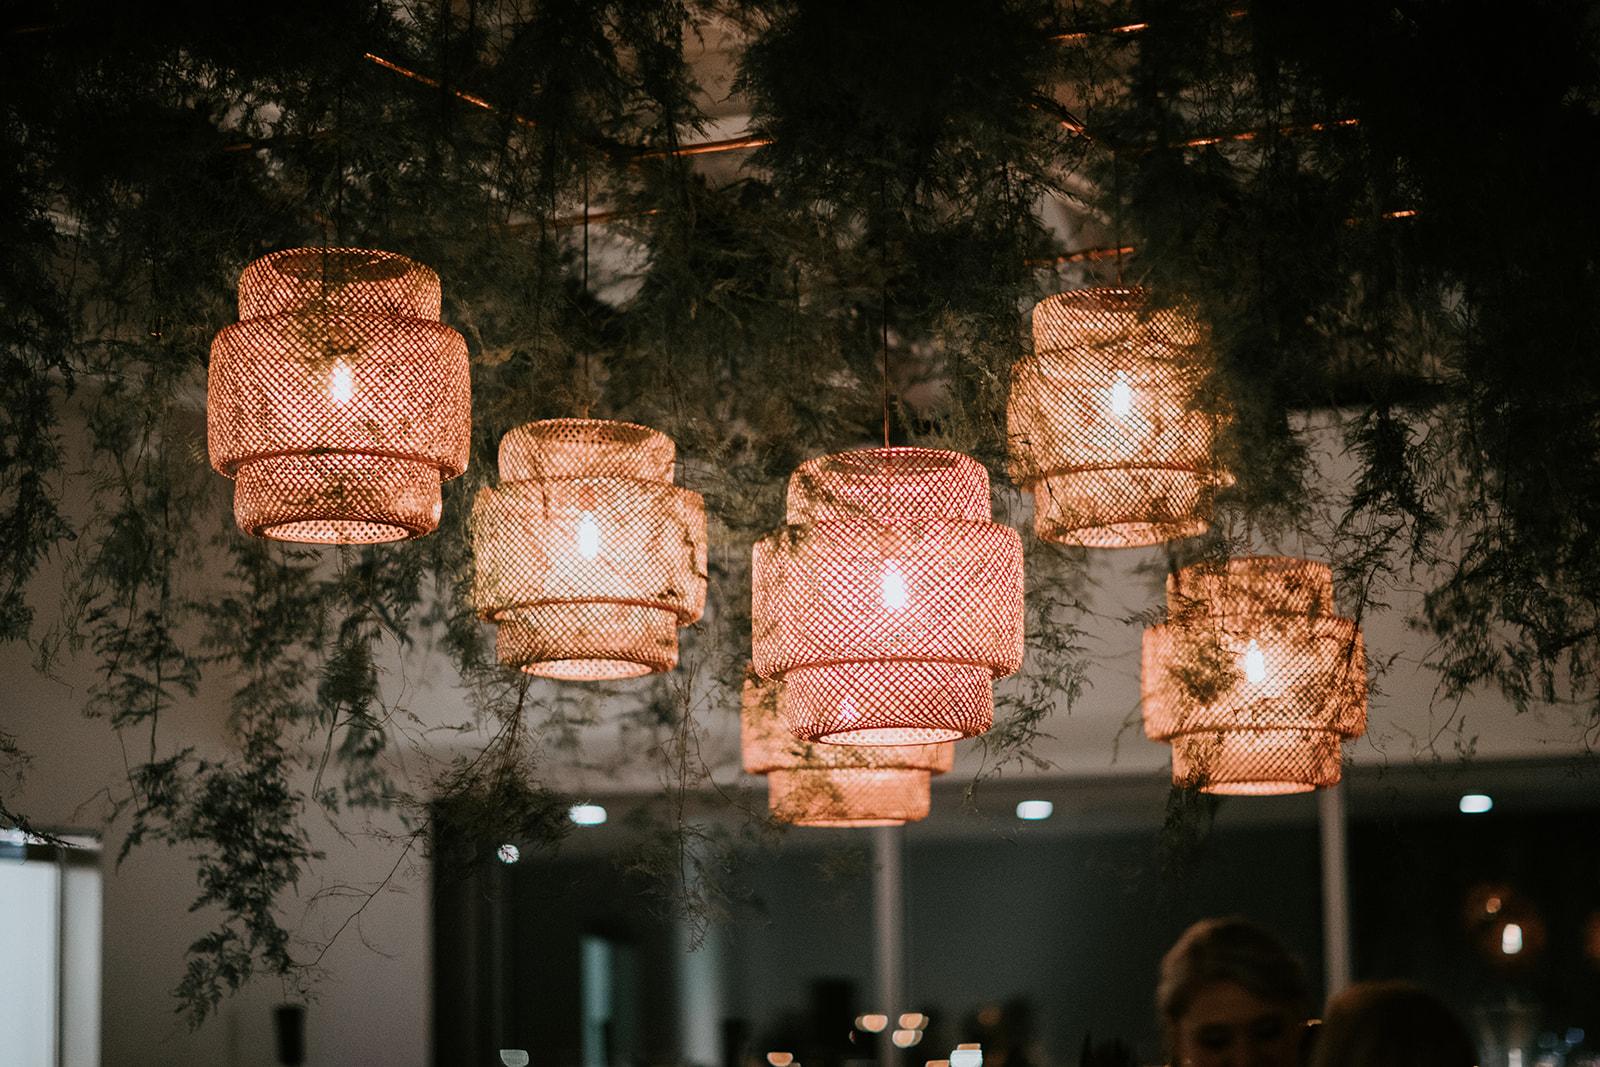 david pendant lights   Quantity: 6  Price: $75.00